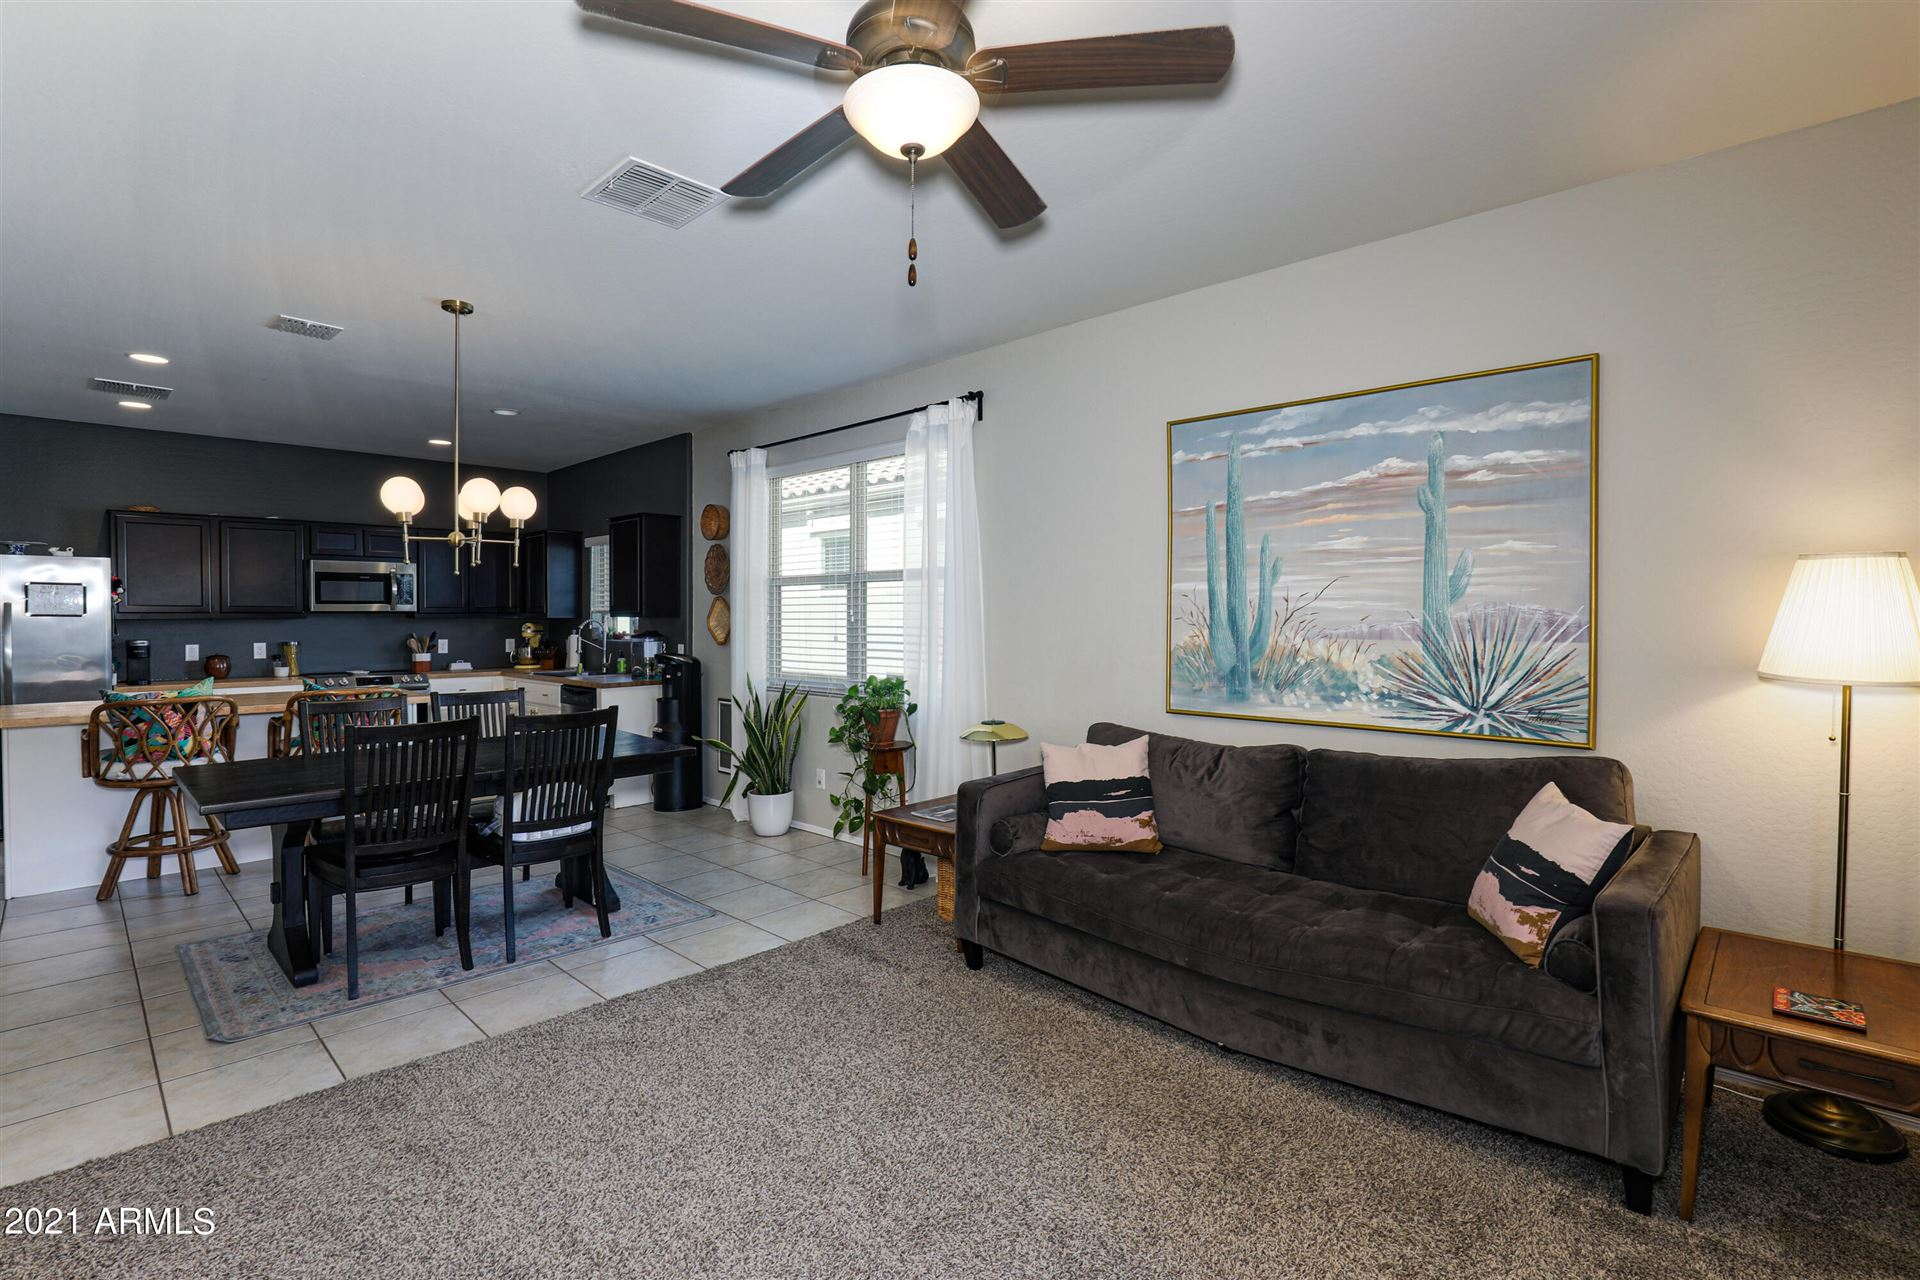 Photo of 41827 W CHATHAM Place, Maricopa, AZ 85138 (MLS # 6307759)